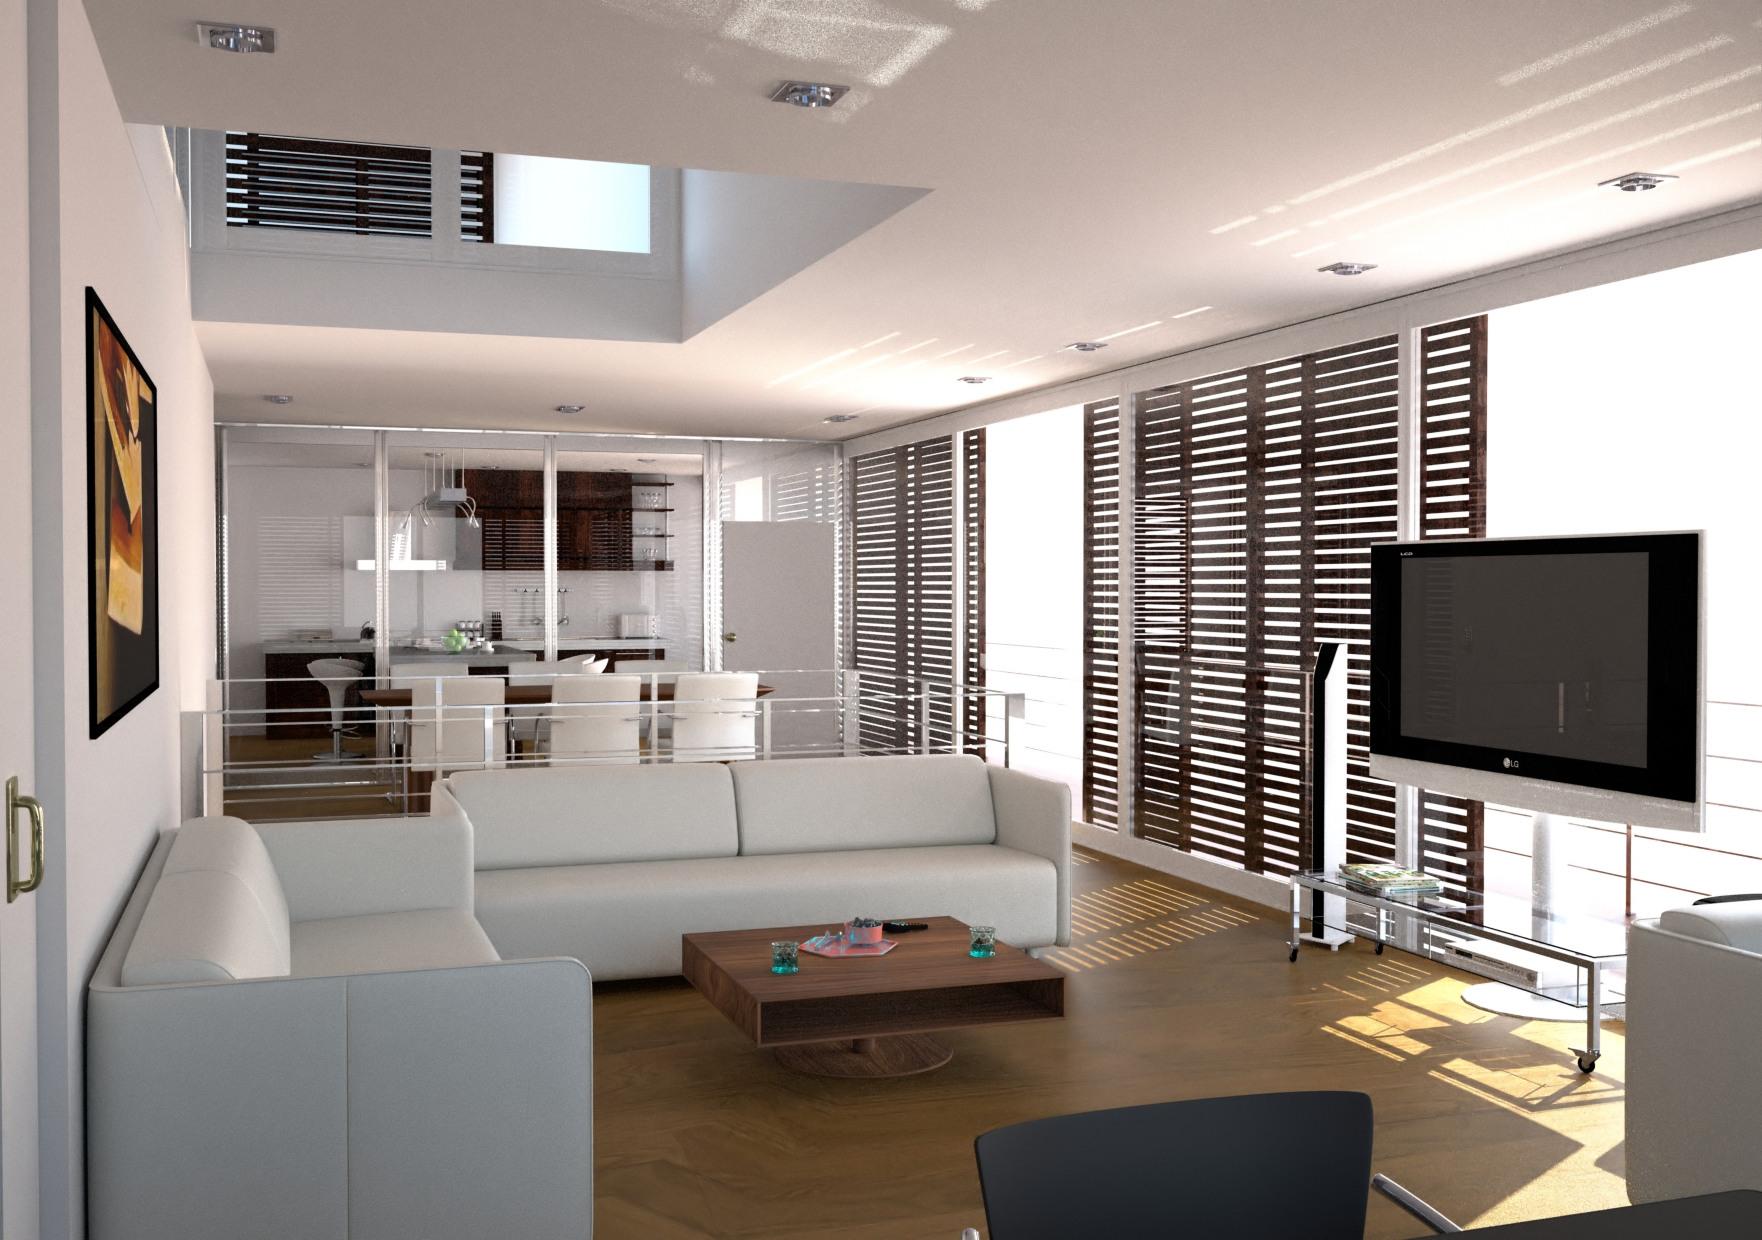 Interior design of the house bedroom coherent interior design by Geometrix XLDWEGB